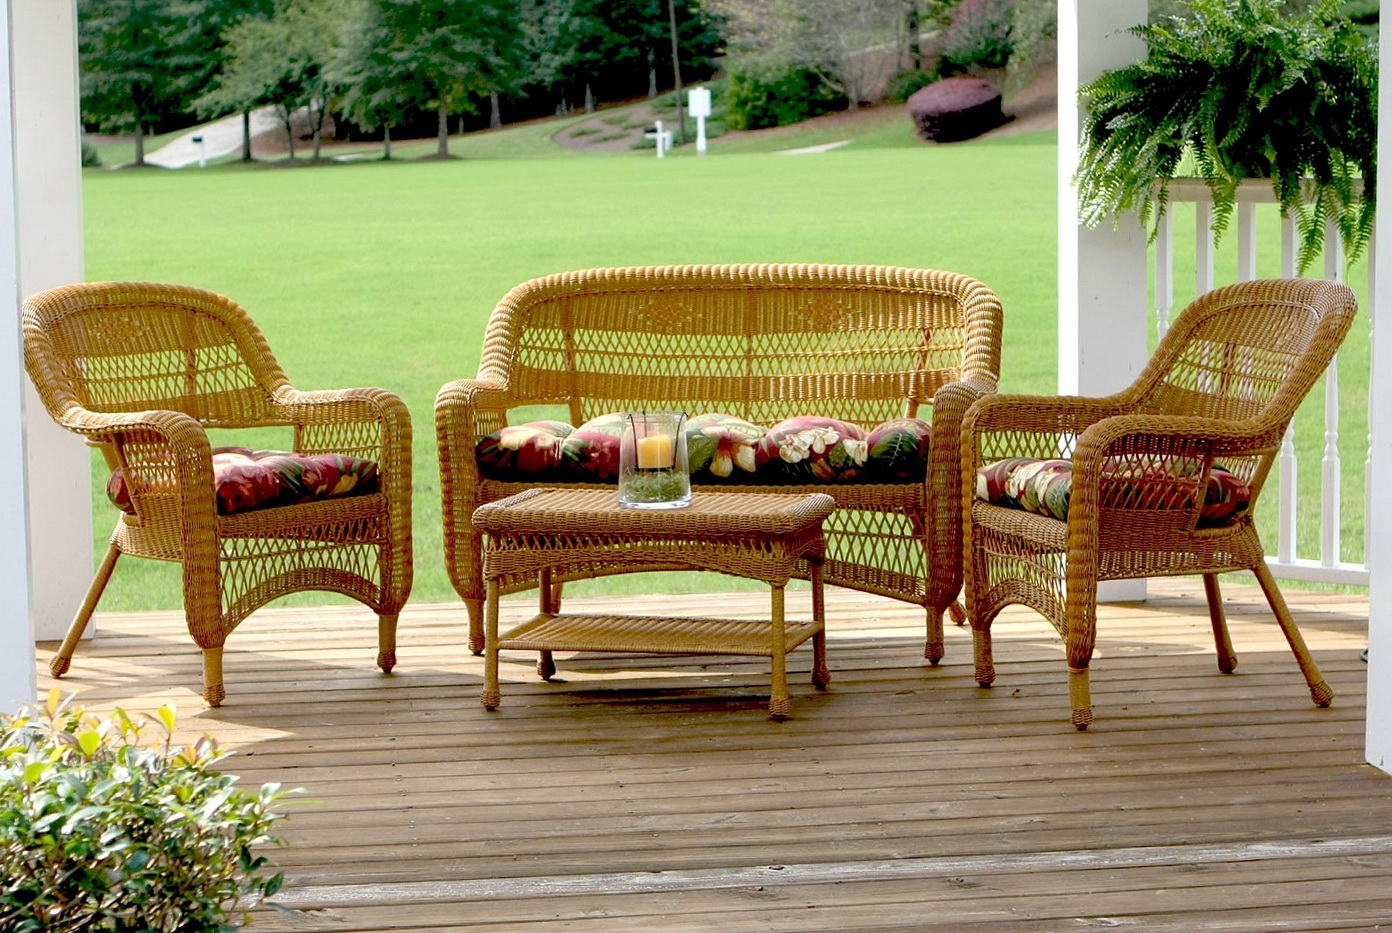 Patio Furniture Cushions Home Depot | Home Design Ideas